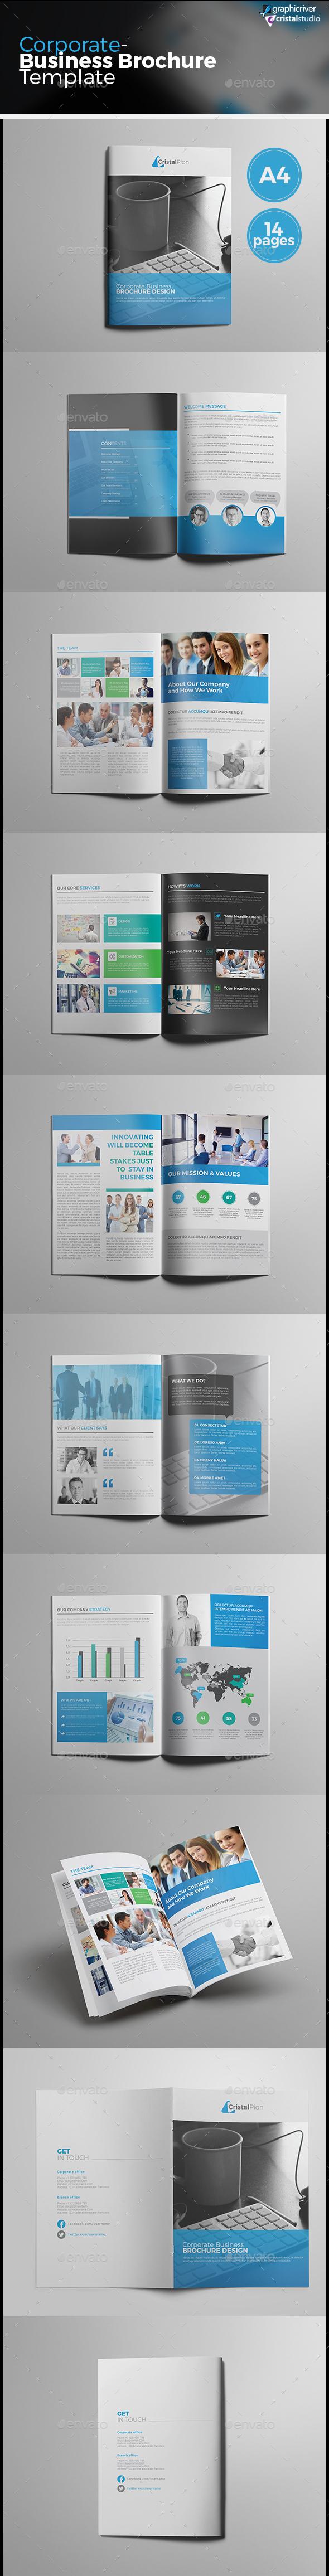 Corporate Business Catalog/Brochure - Corporate Brochures